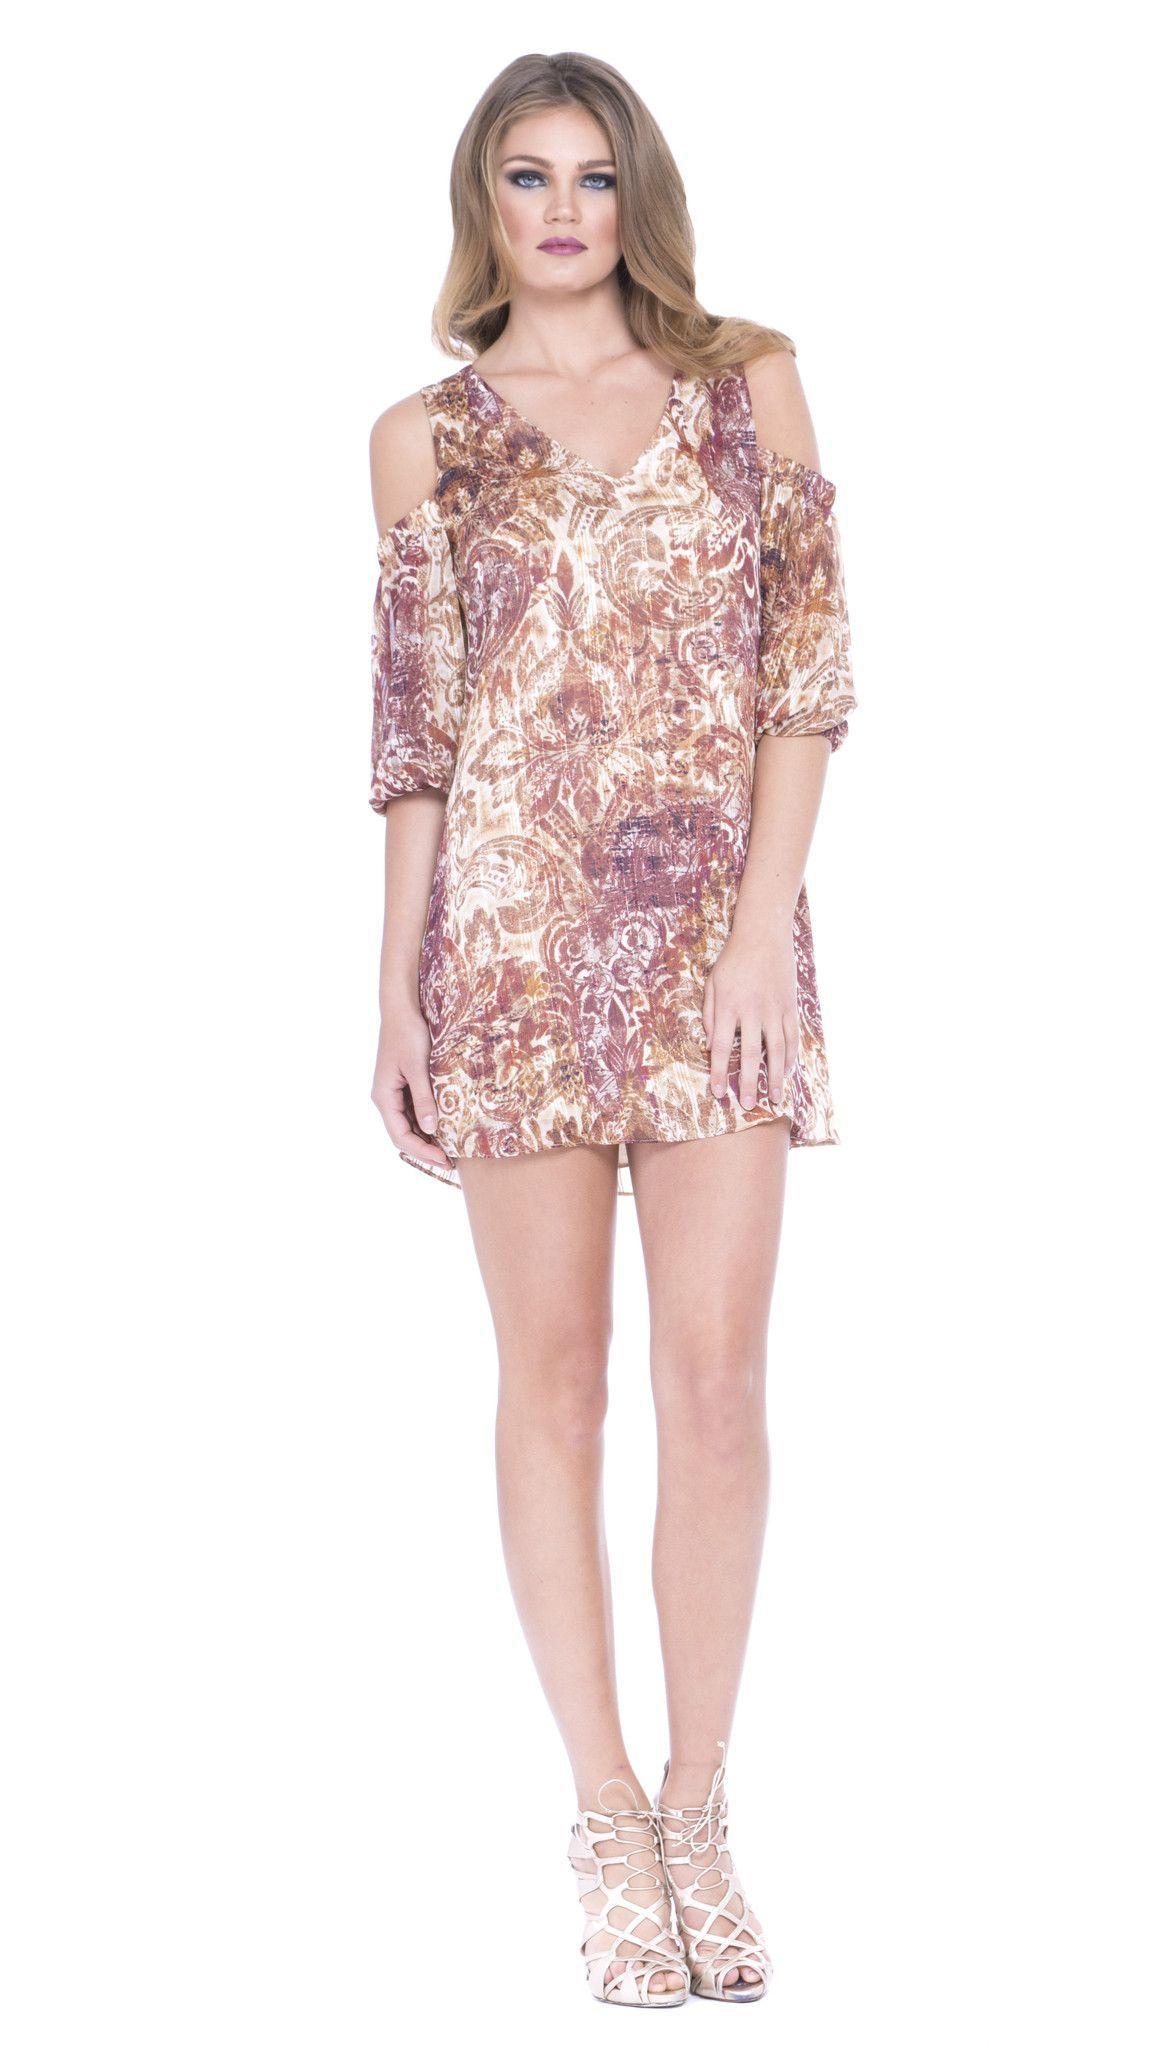 Atina Cristina Cold Shoulder Dress